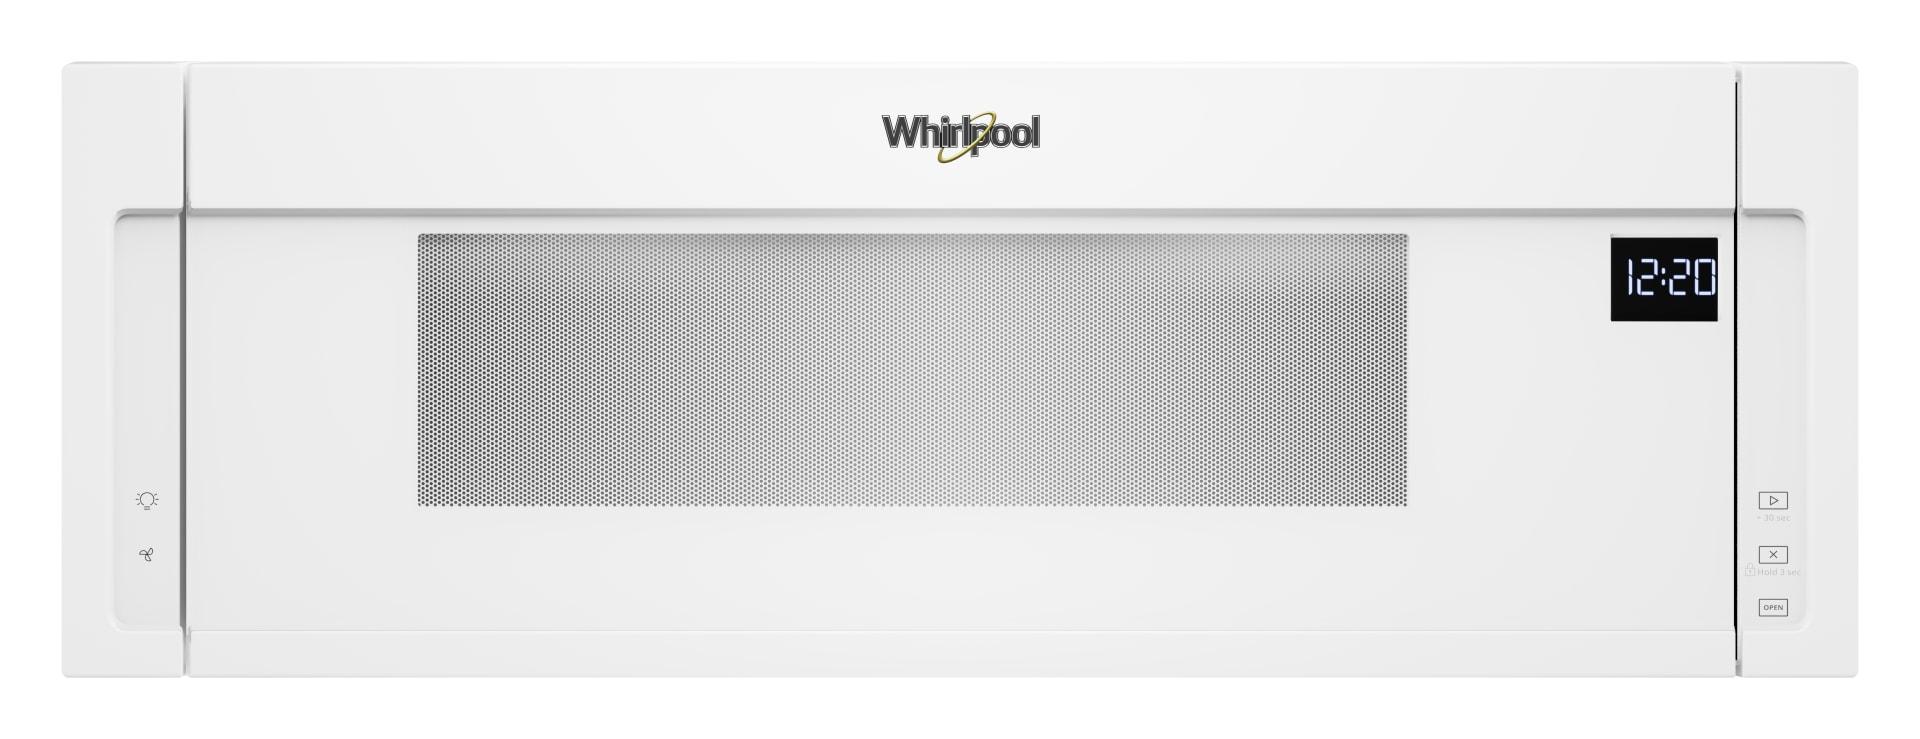 wml55011hw whirlpool 1 1 cu ft low